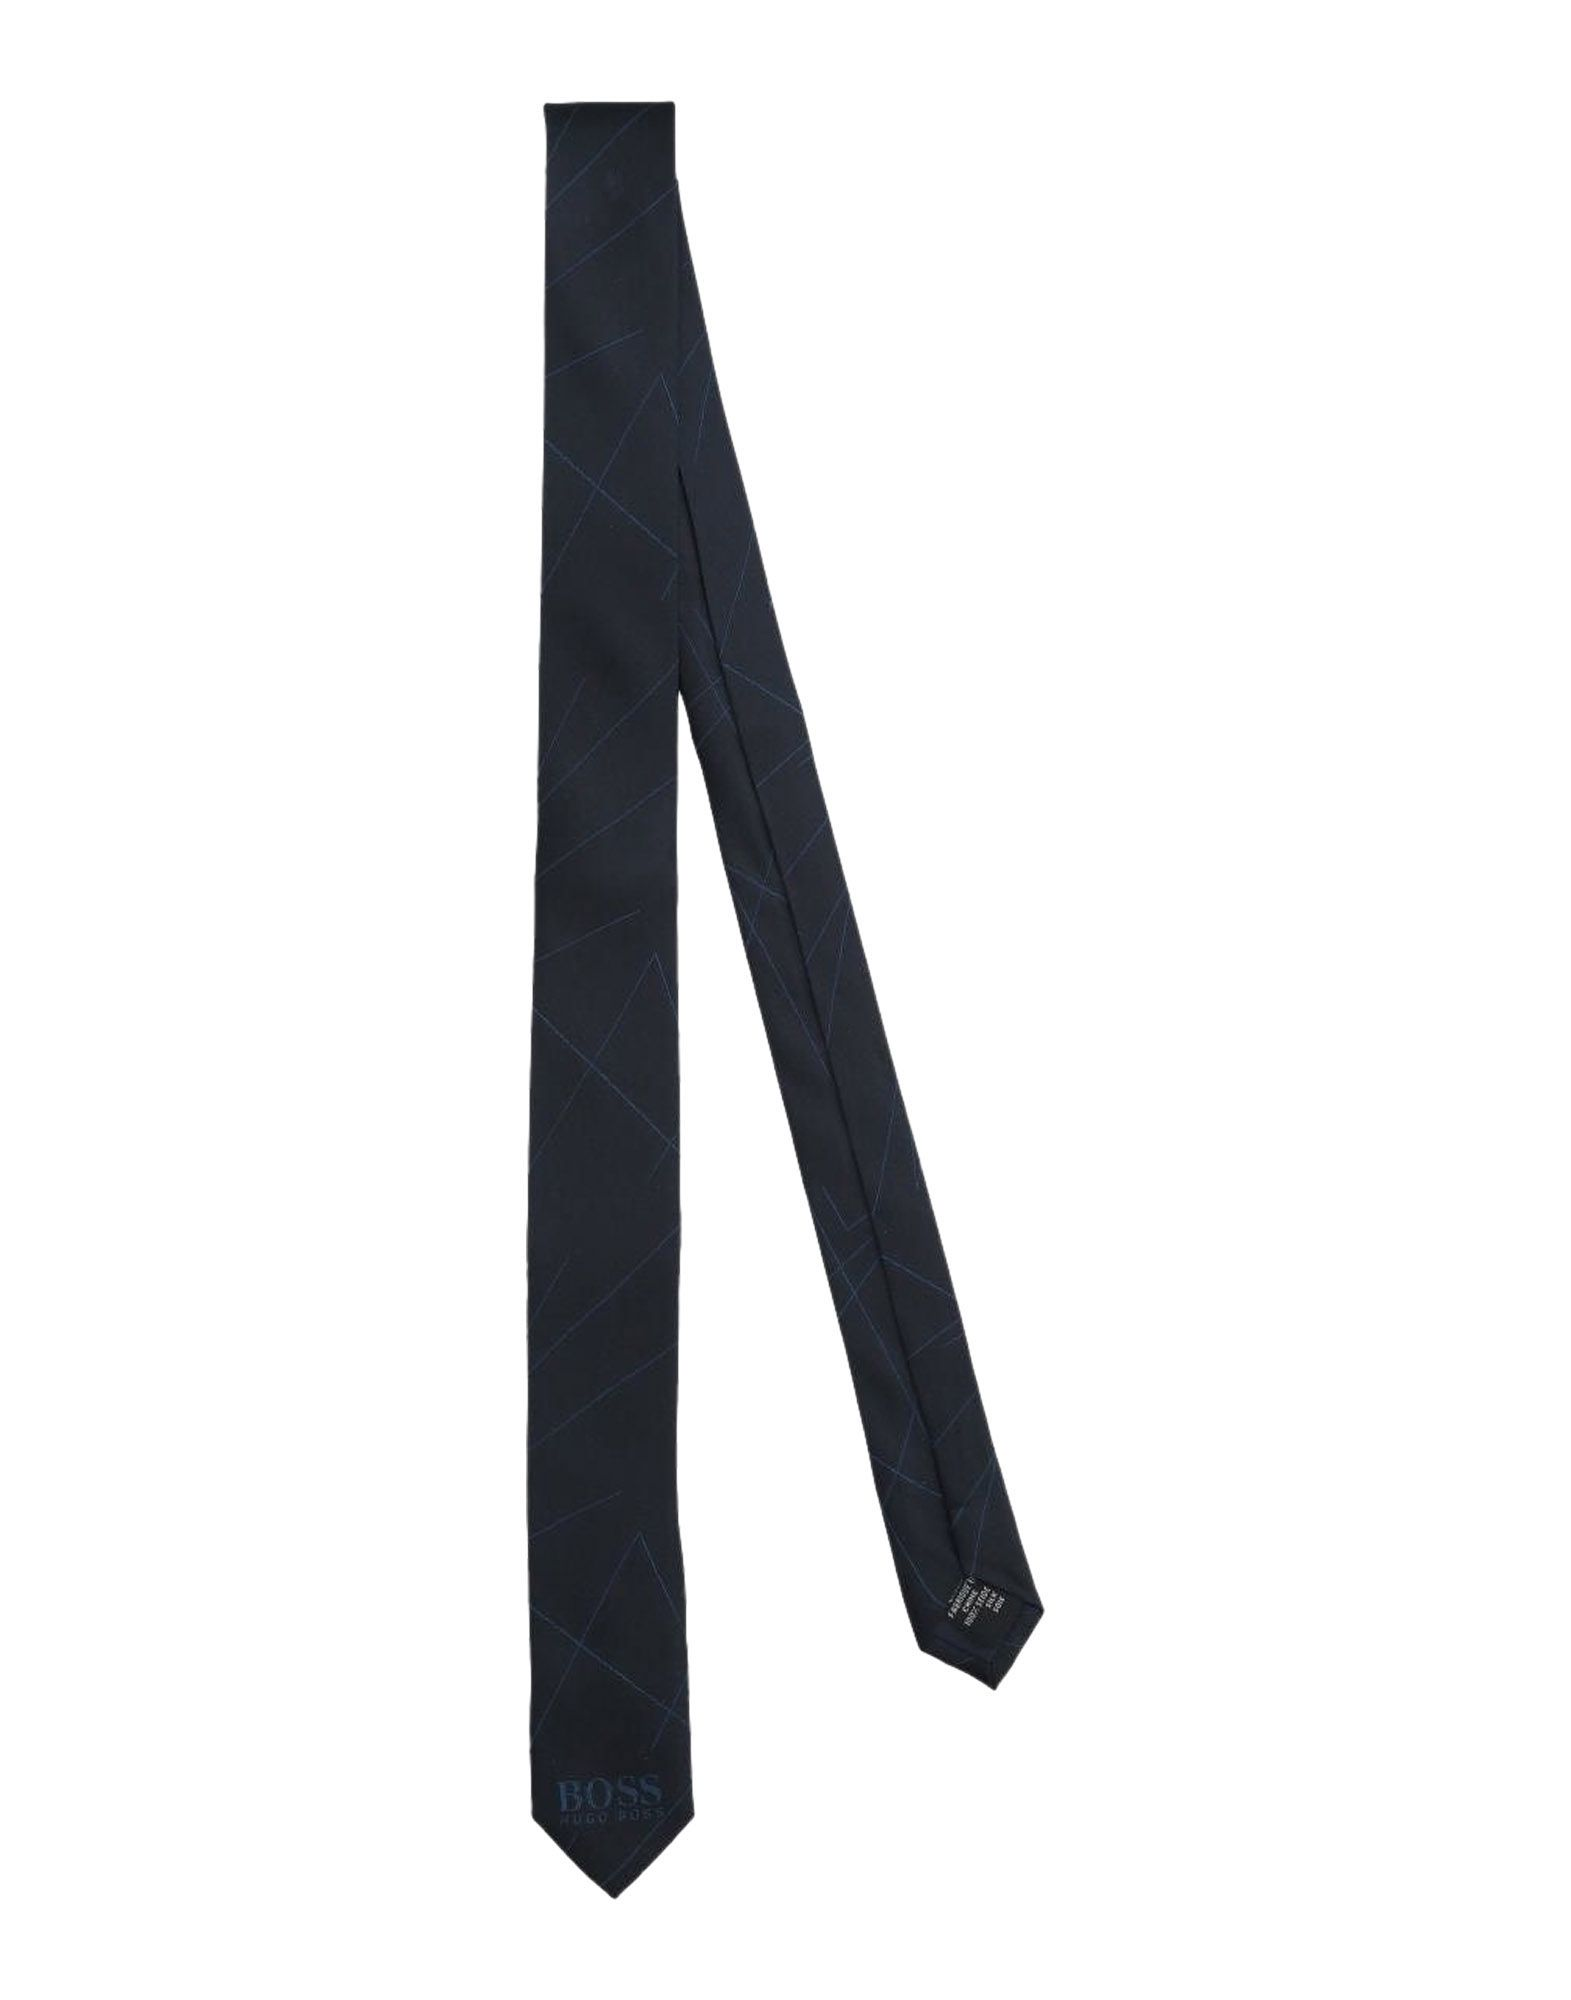 BOSS Галстук галстук hugo boss галстук